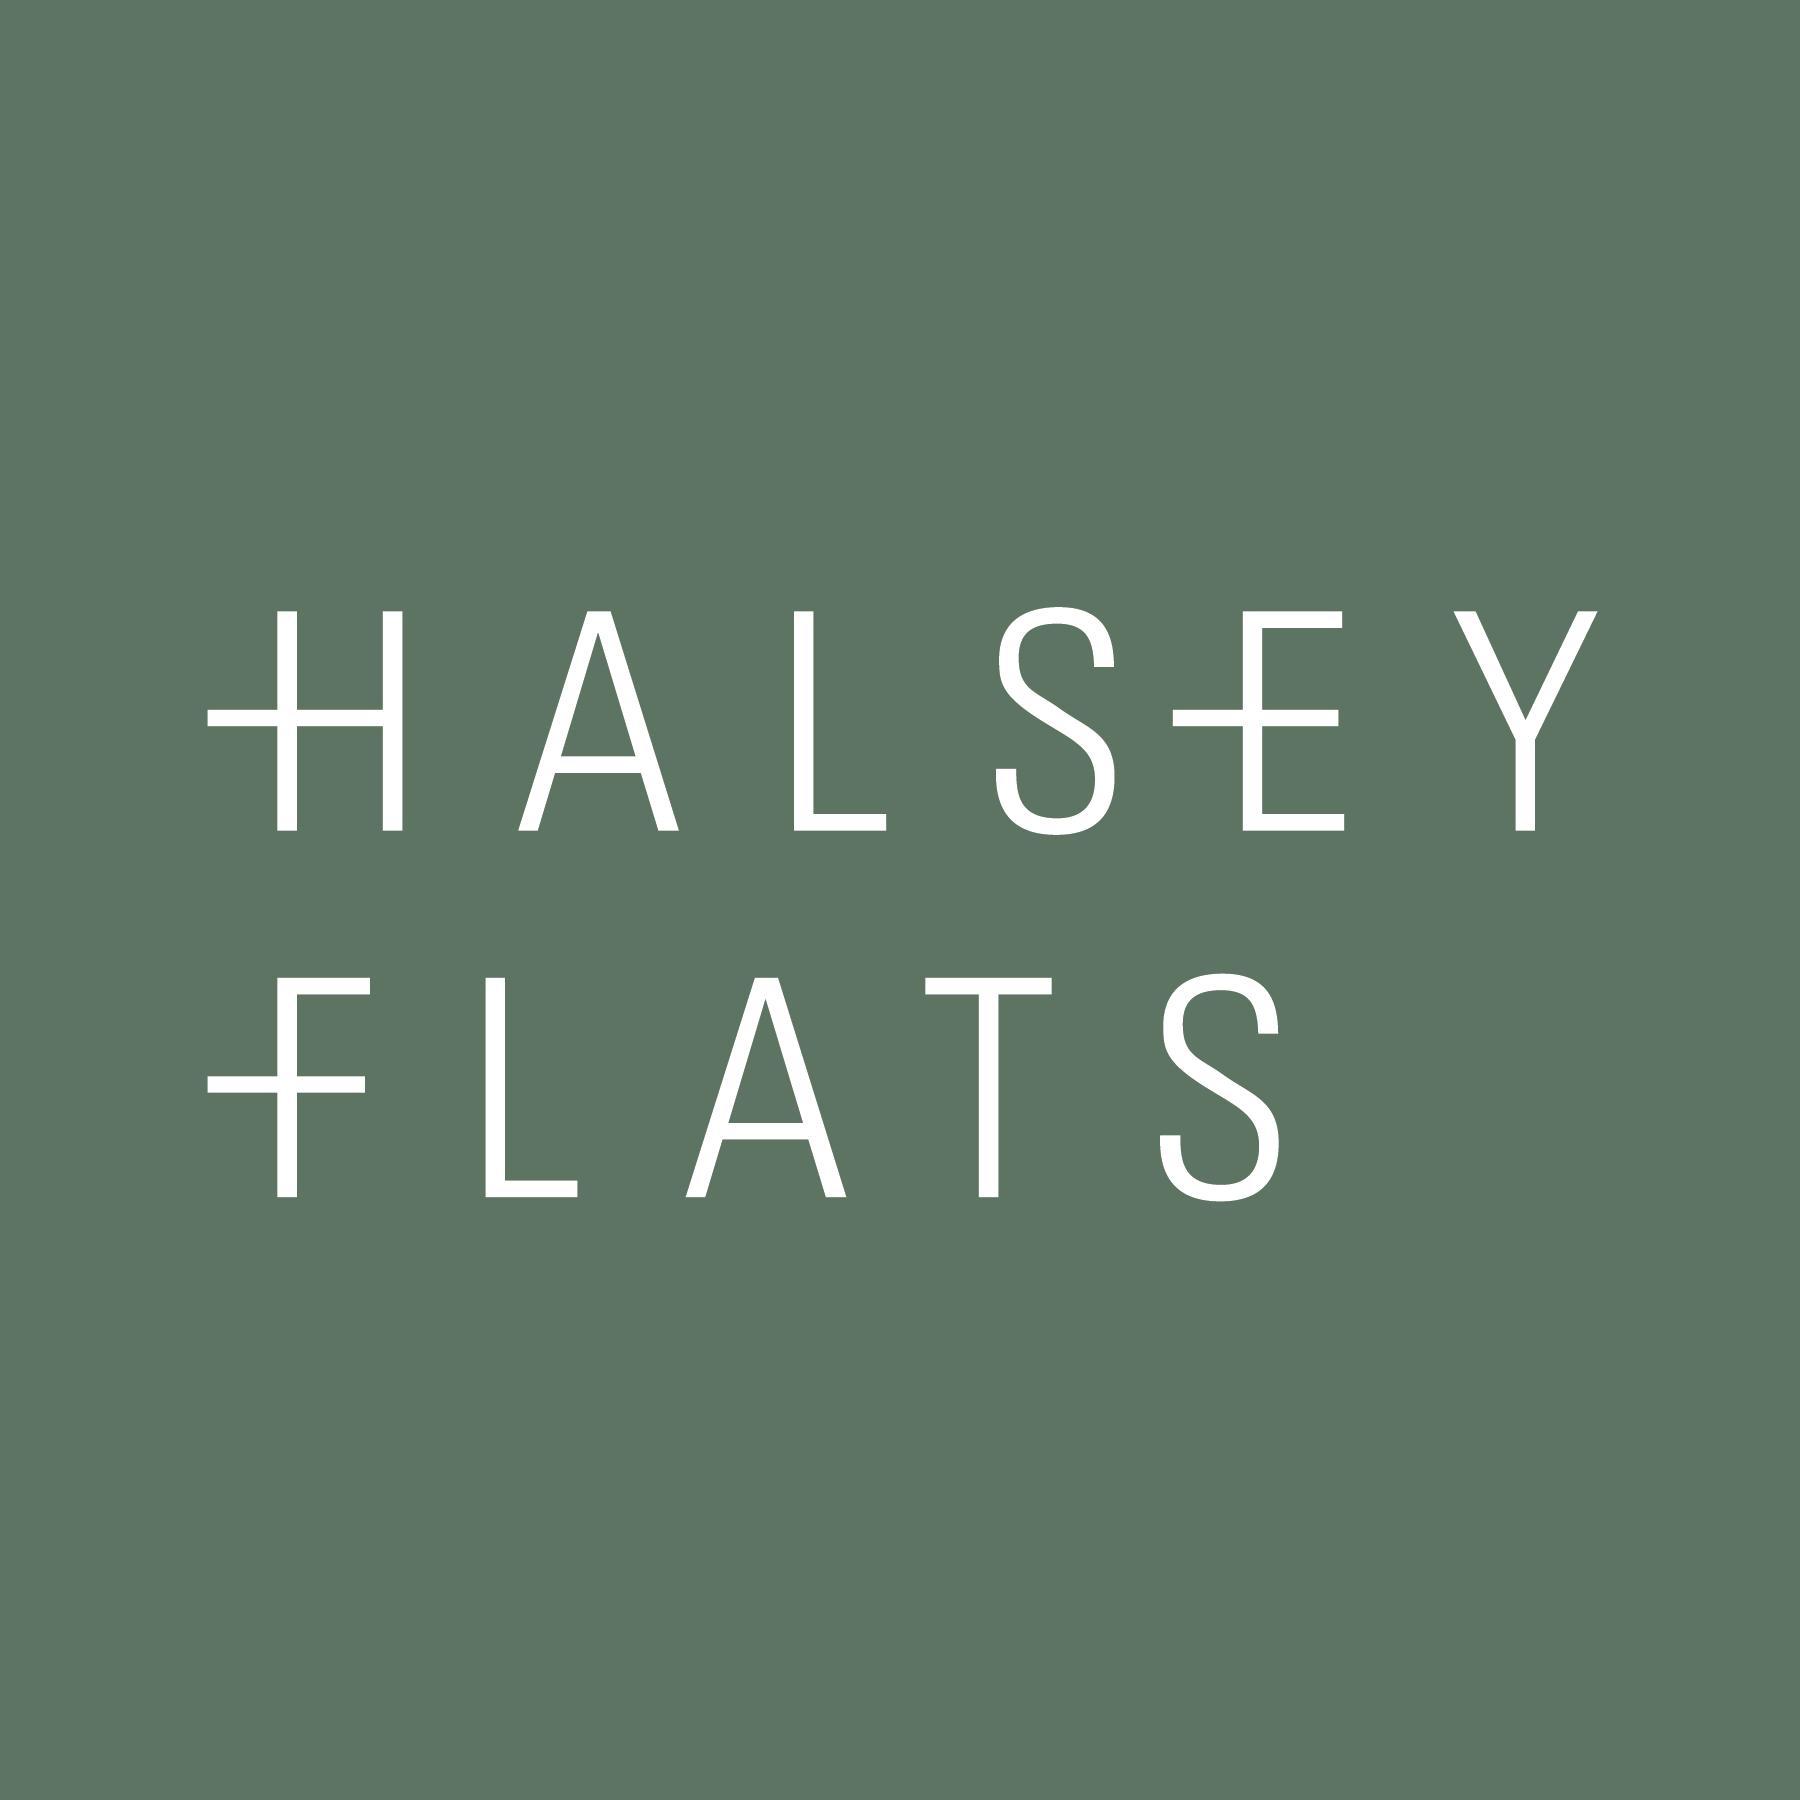 Halsey Flats